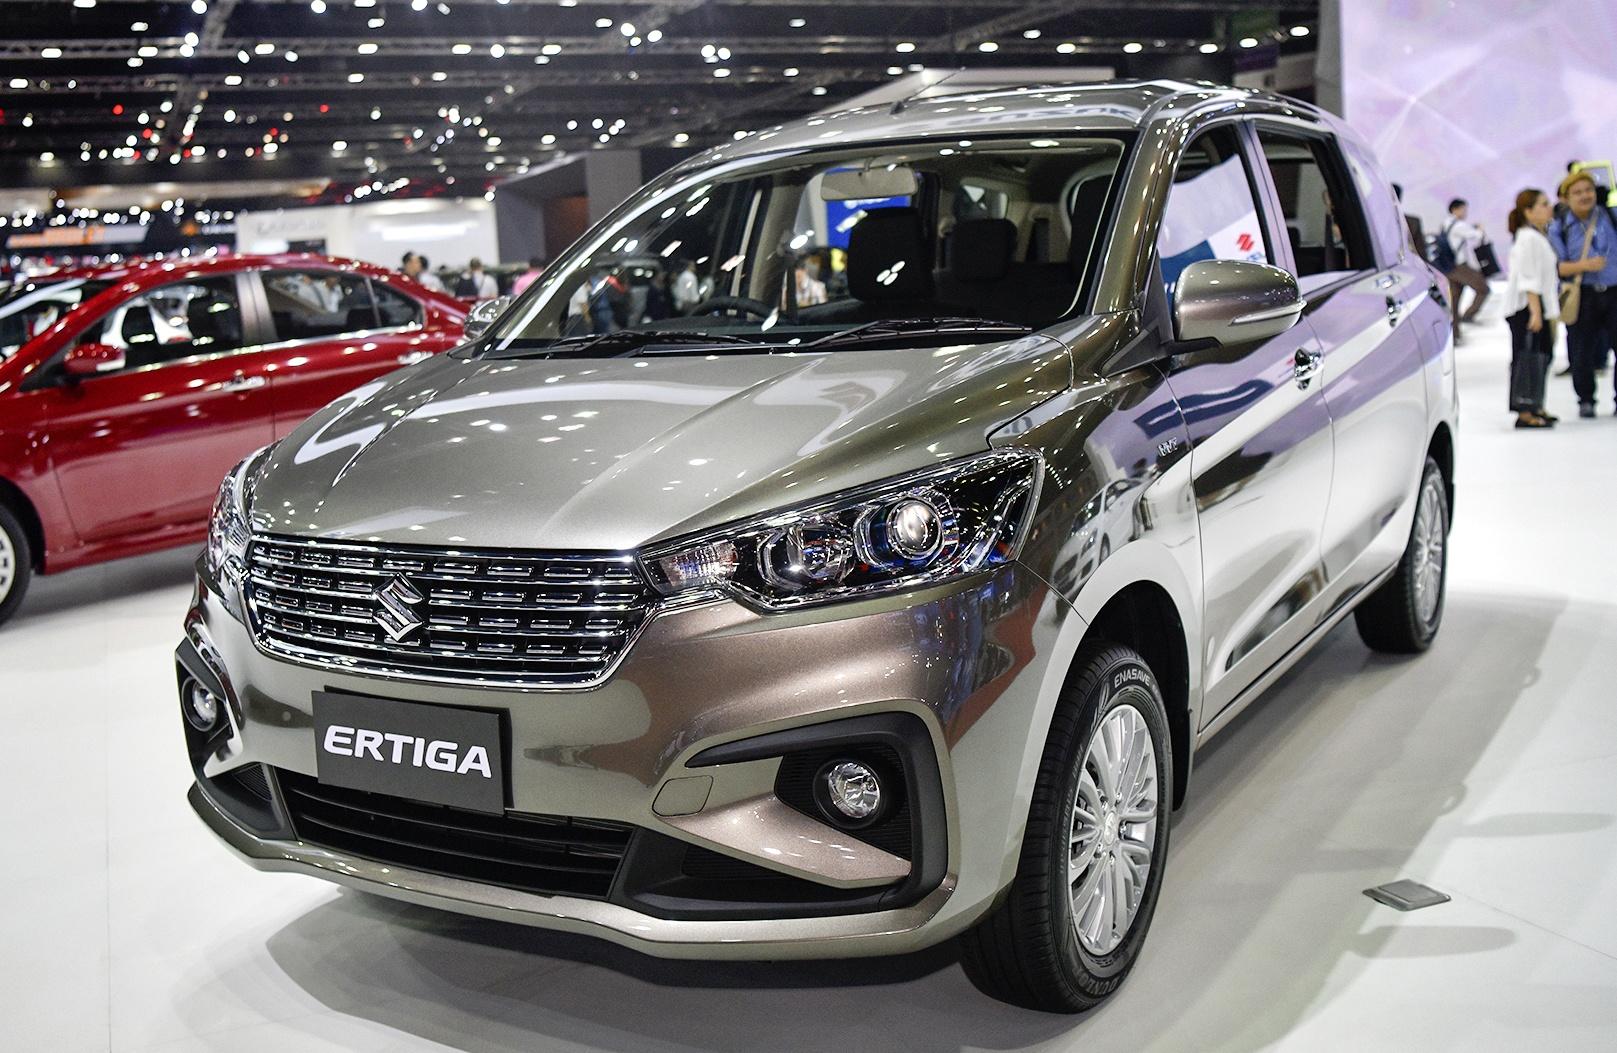 xe Suzuki Ertiga 2019 tai muaxegiabeo 15 - Suzuki Ertiga [hienthinam]: giá xe và khuyến mãi tháng [hienthithang]